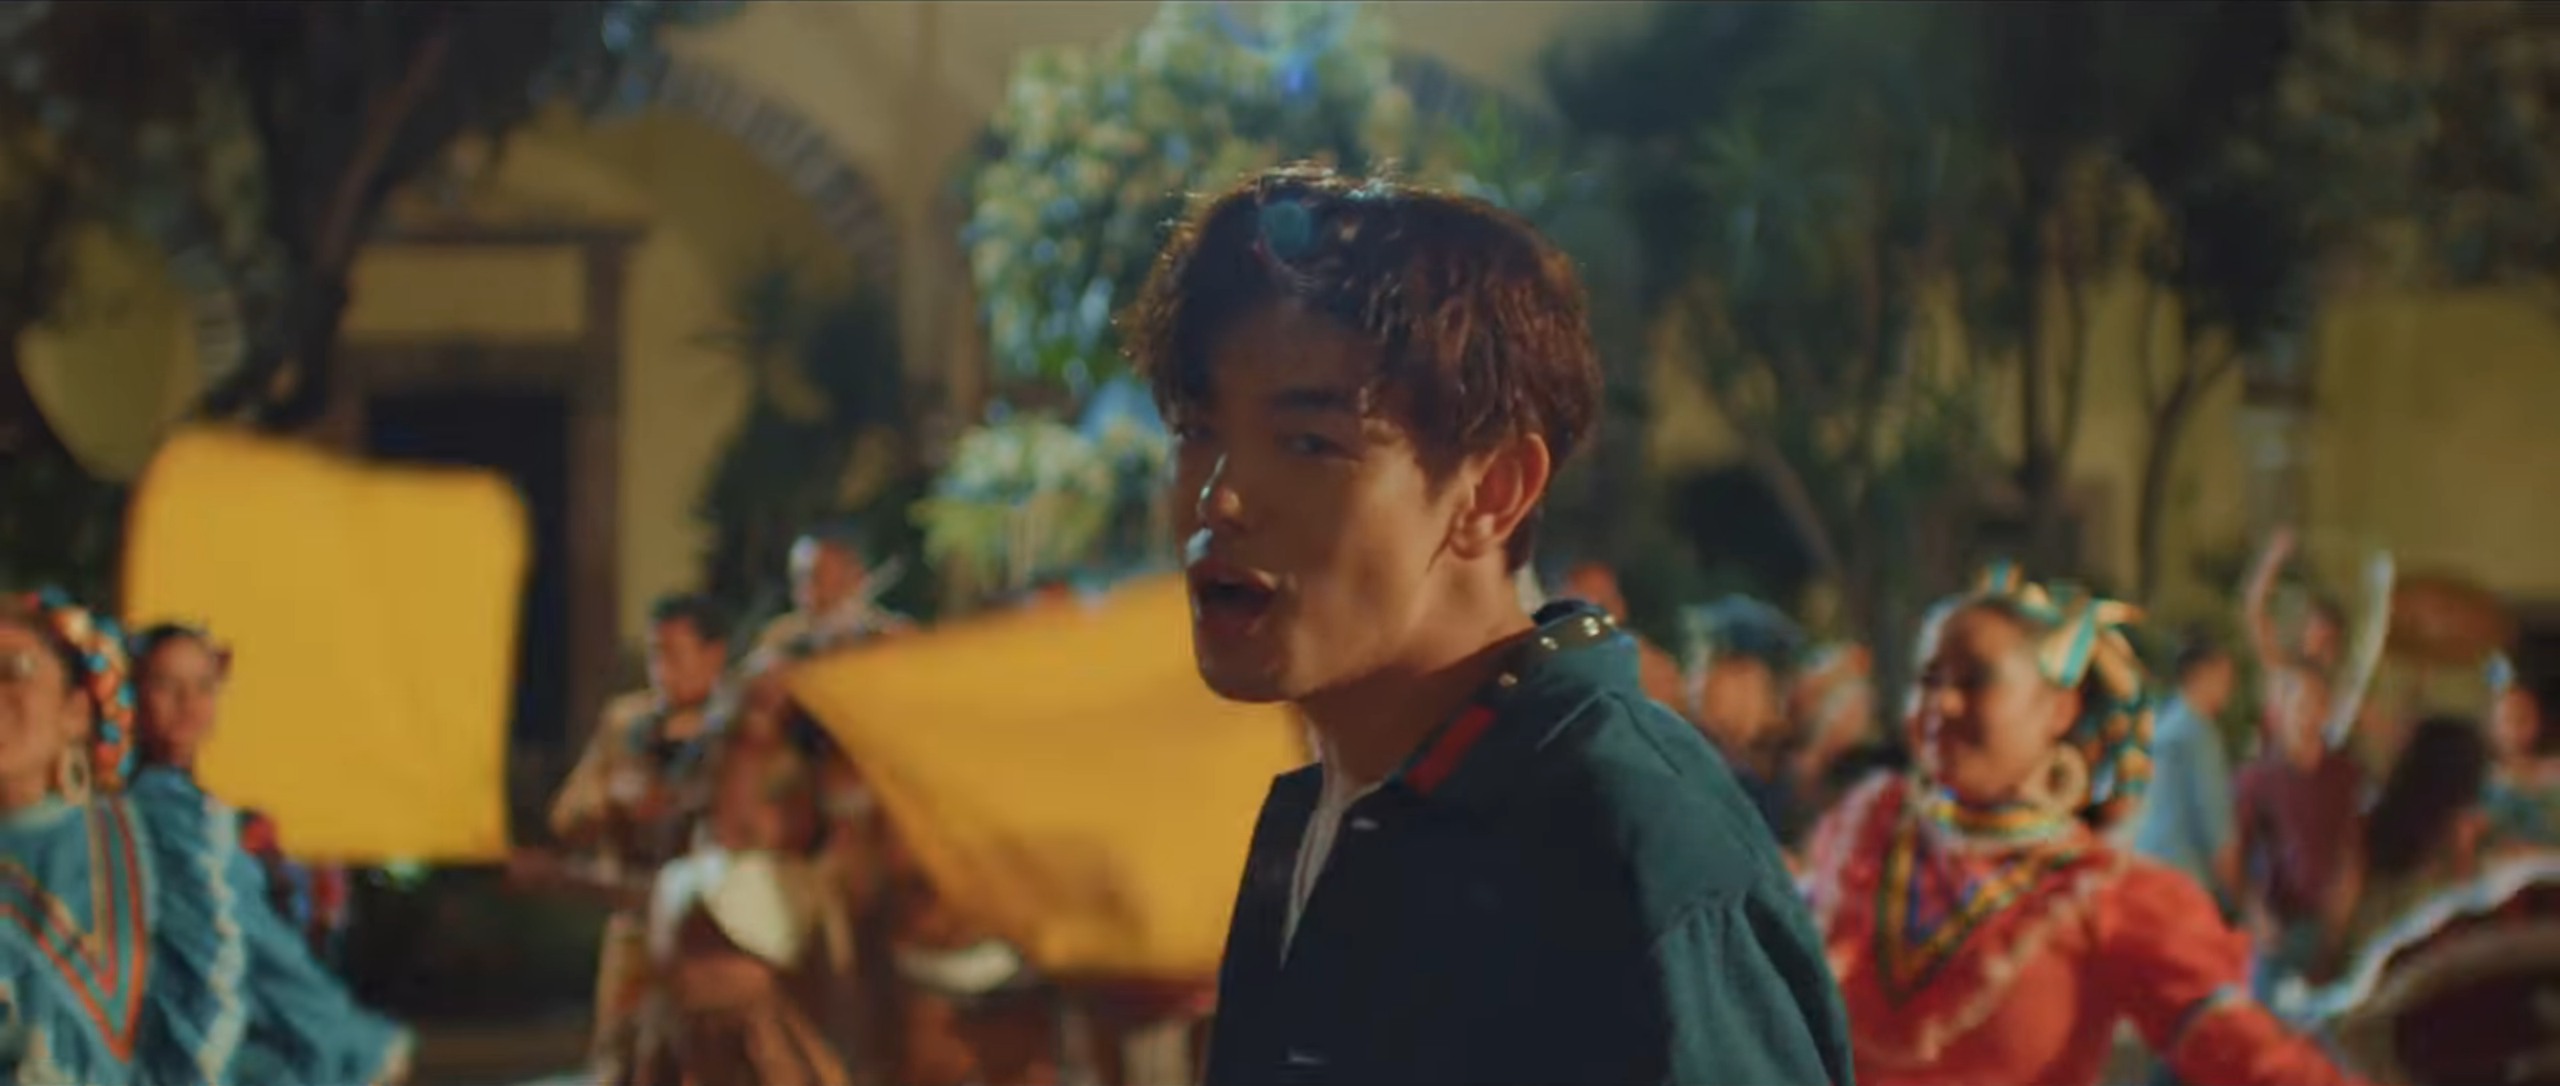 Music and Lyrics: Lost in the Rhythm – Seoulbeats